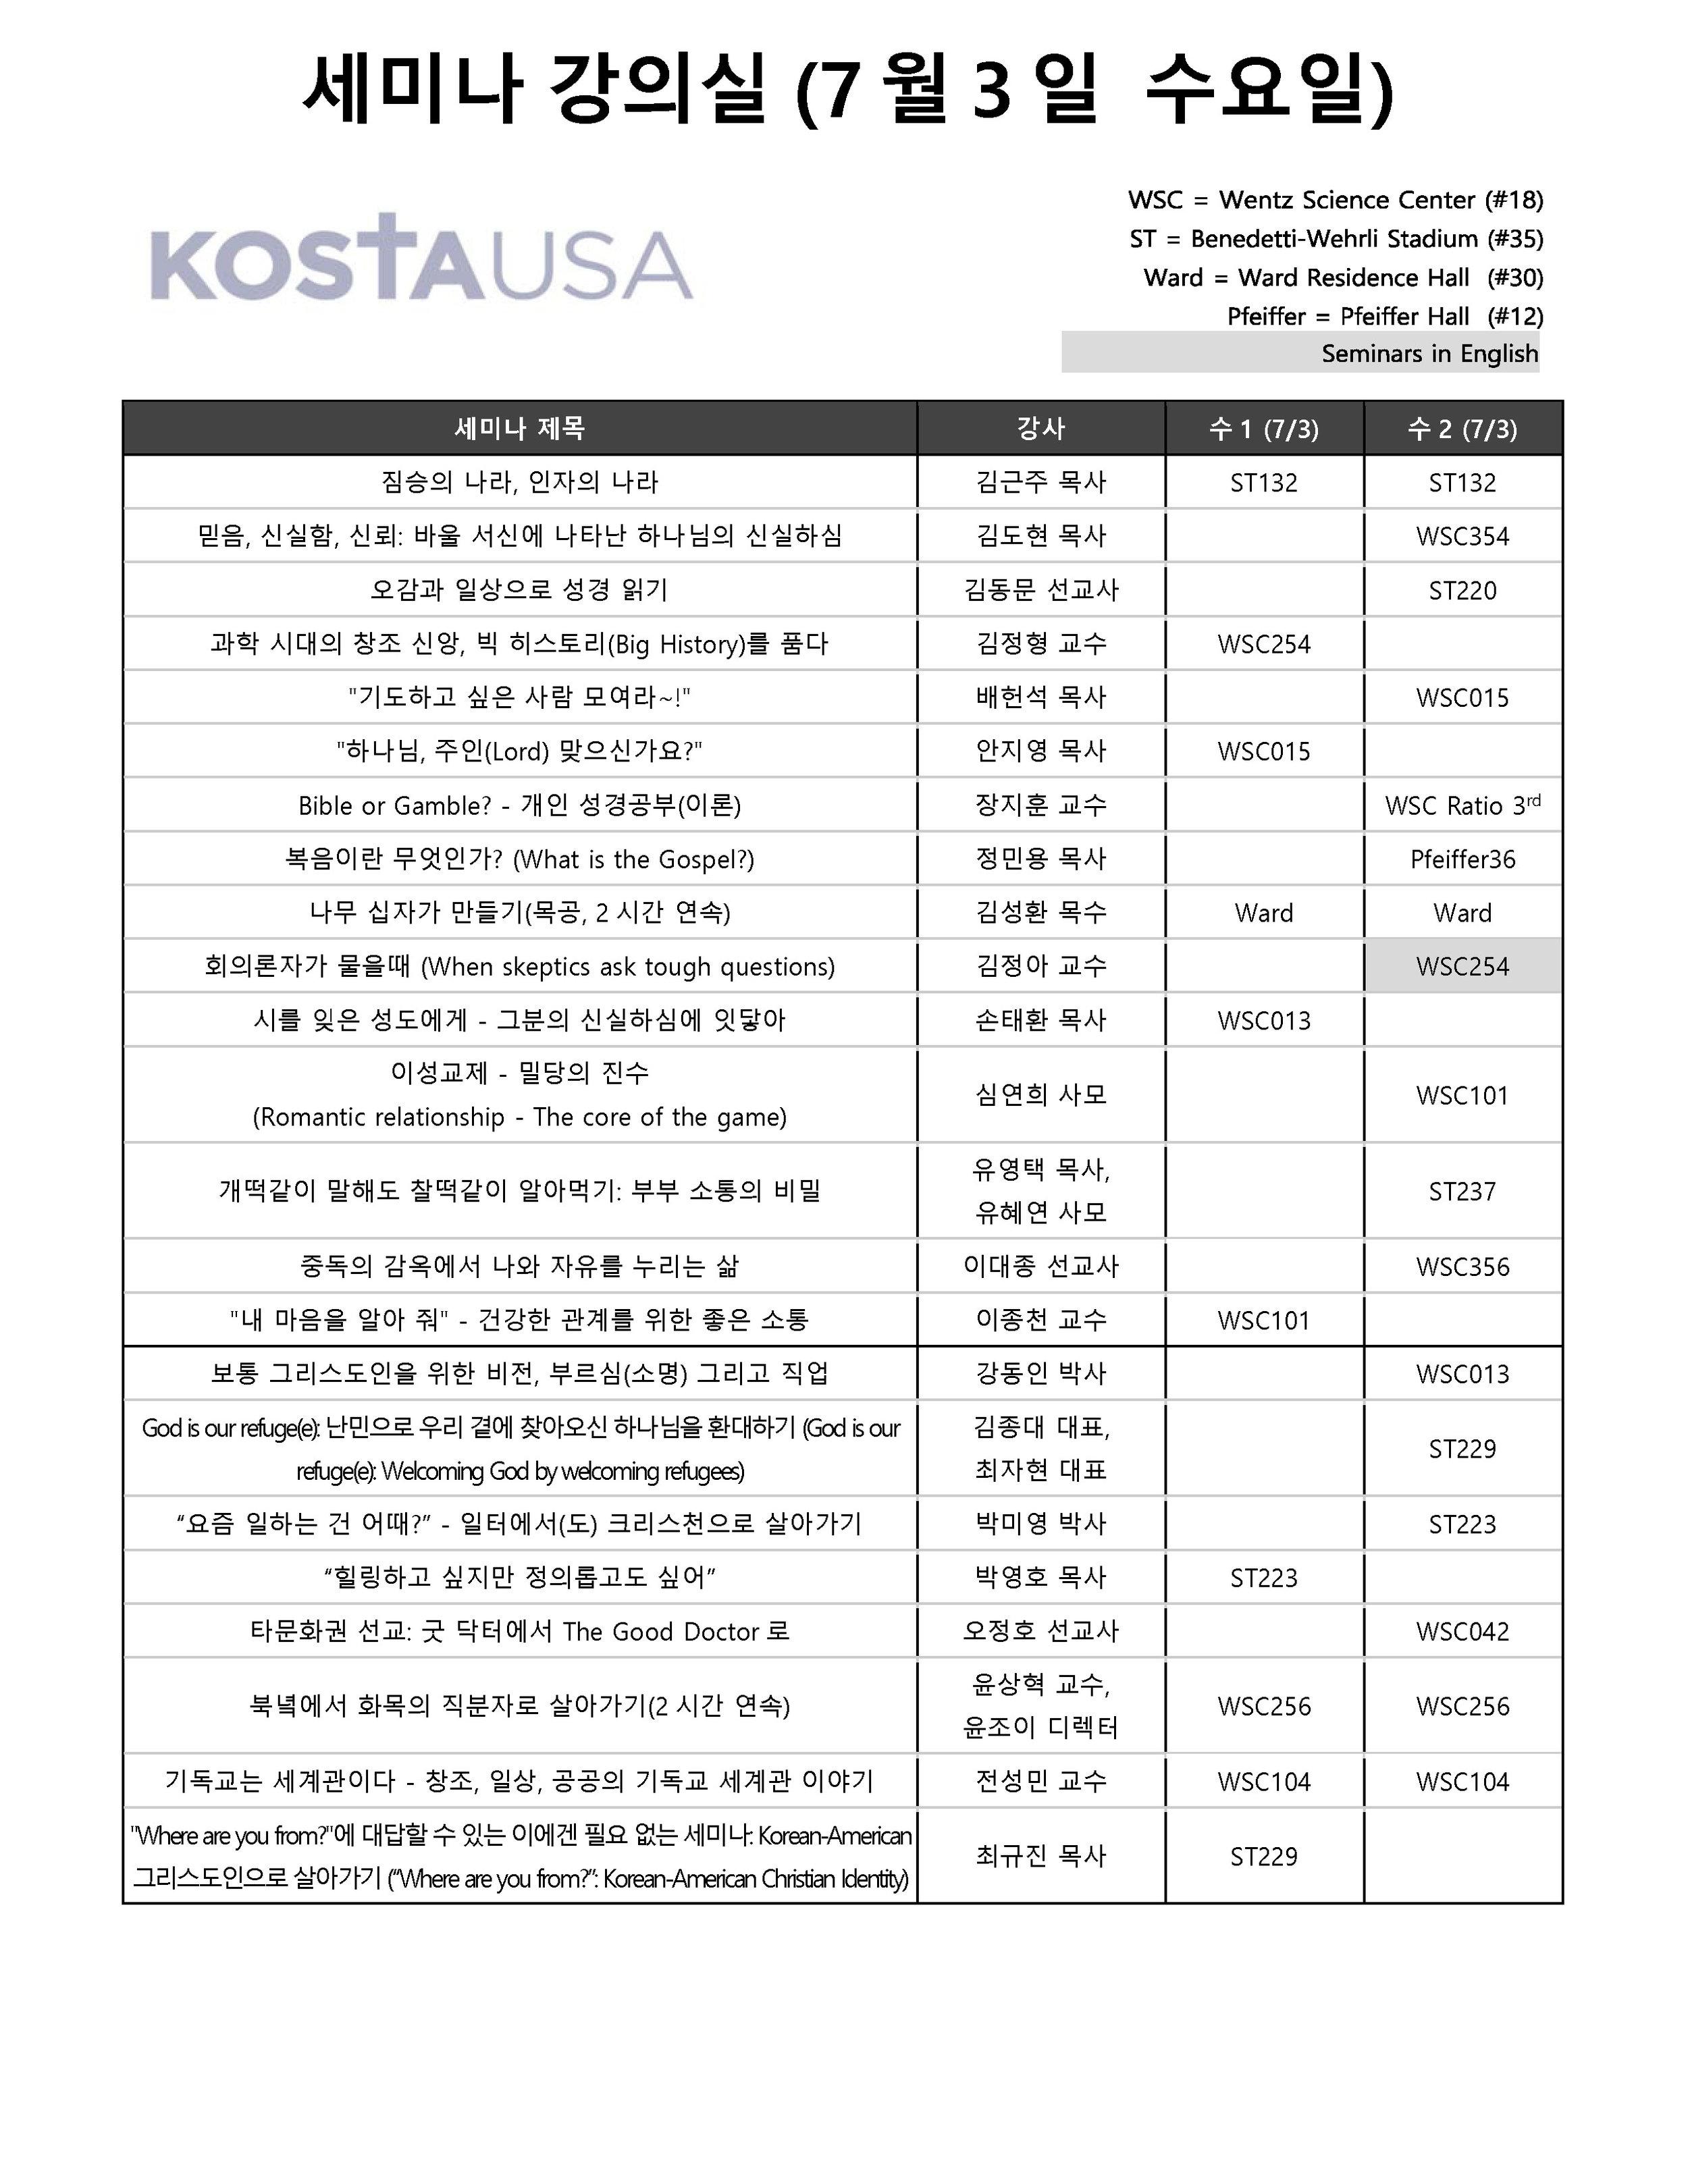 Seminar Daily Schedule 2019 Wed.jpg